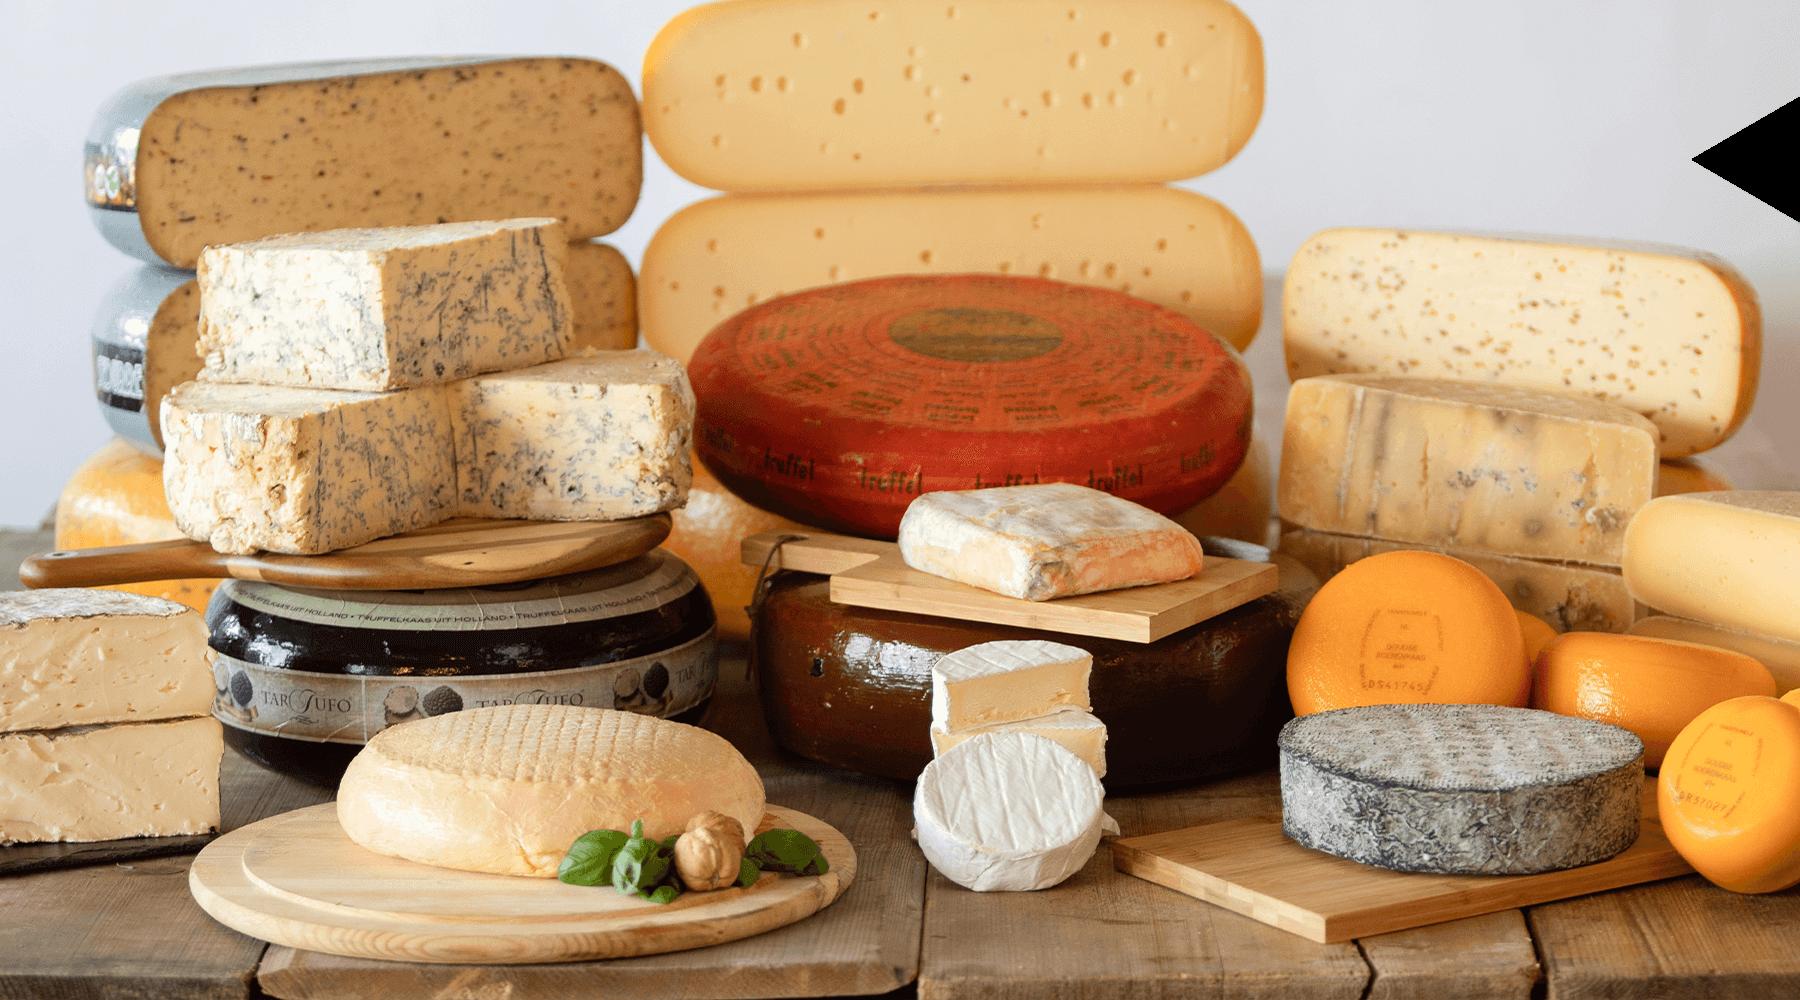 MAAZ Cheese boerenkaas streekkaas assortiment (2)